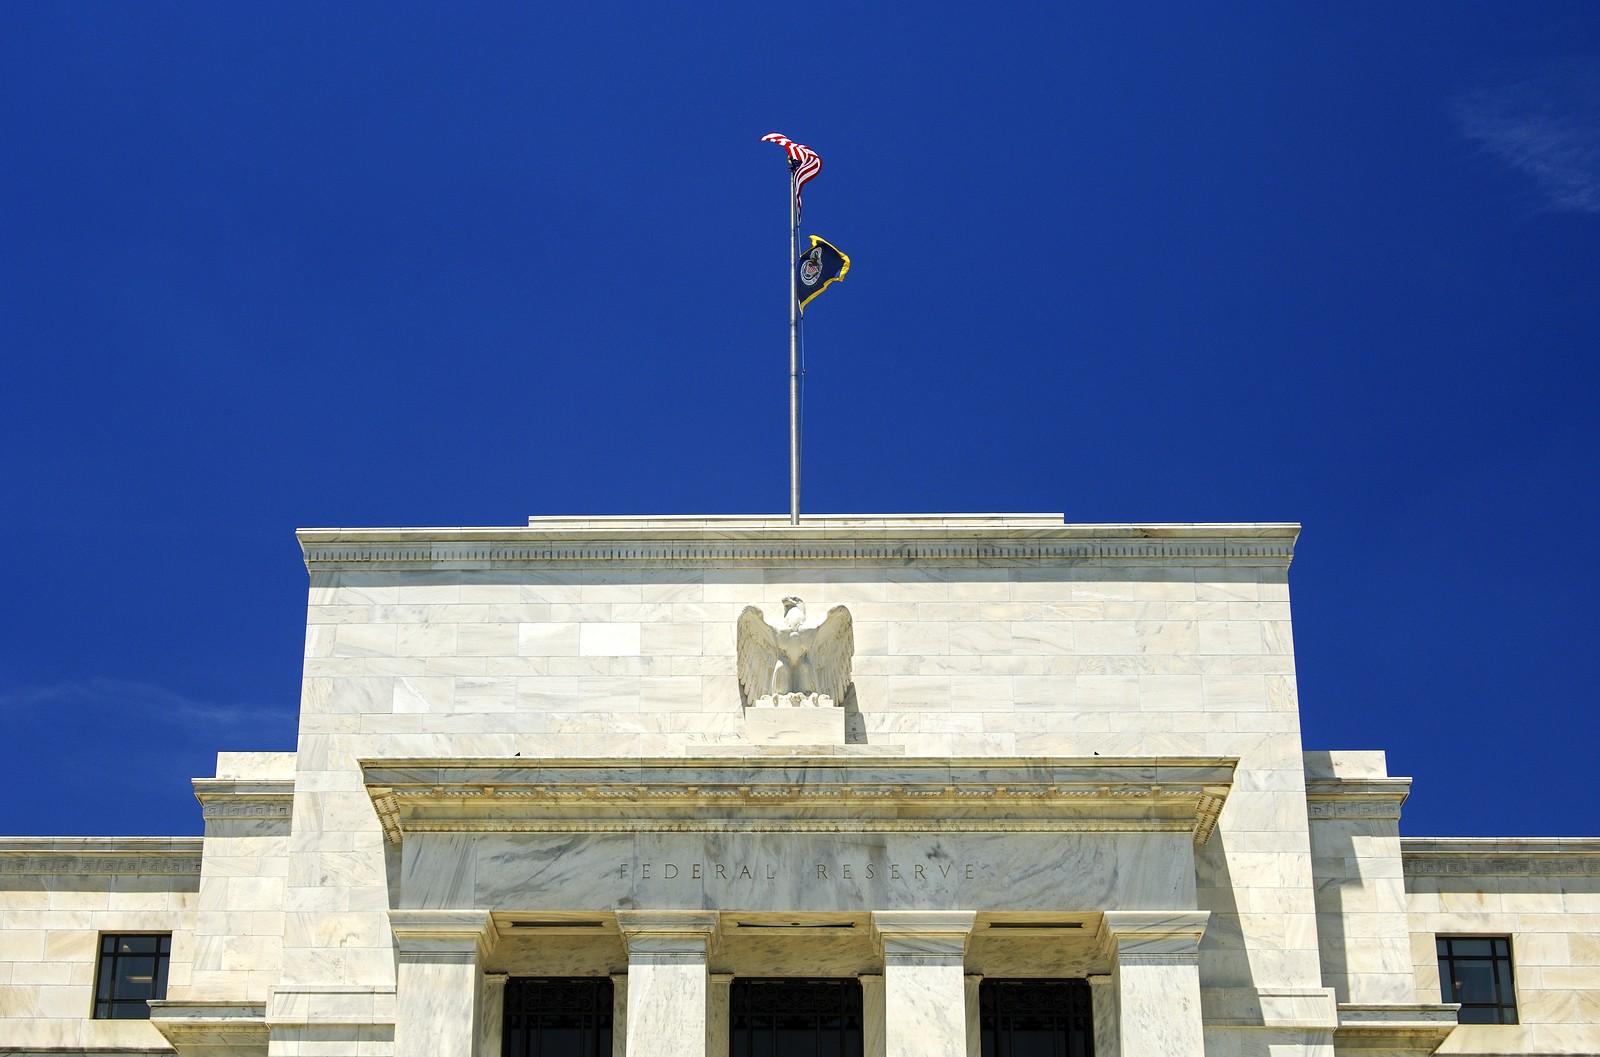 Federal Reserve Washington